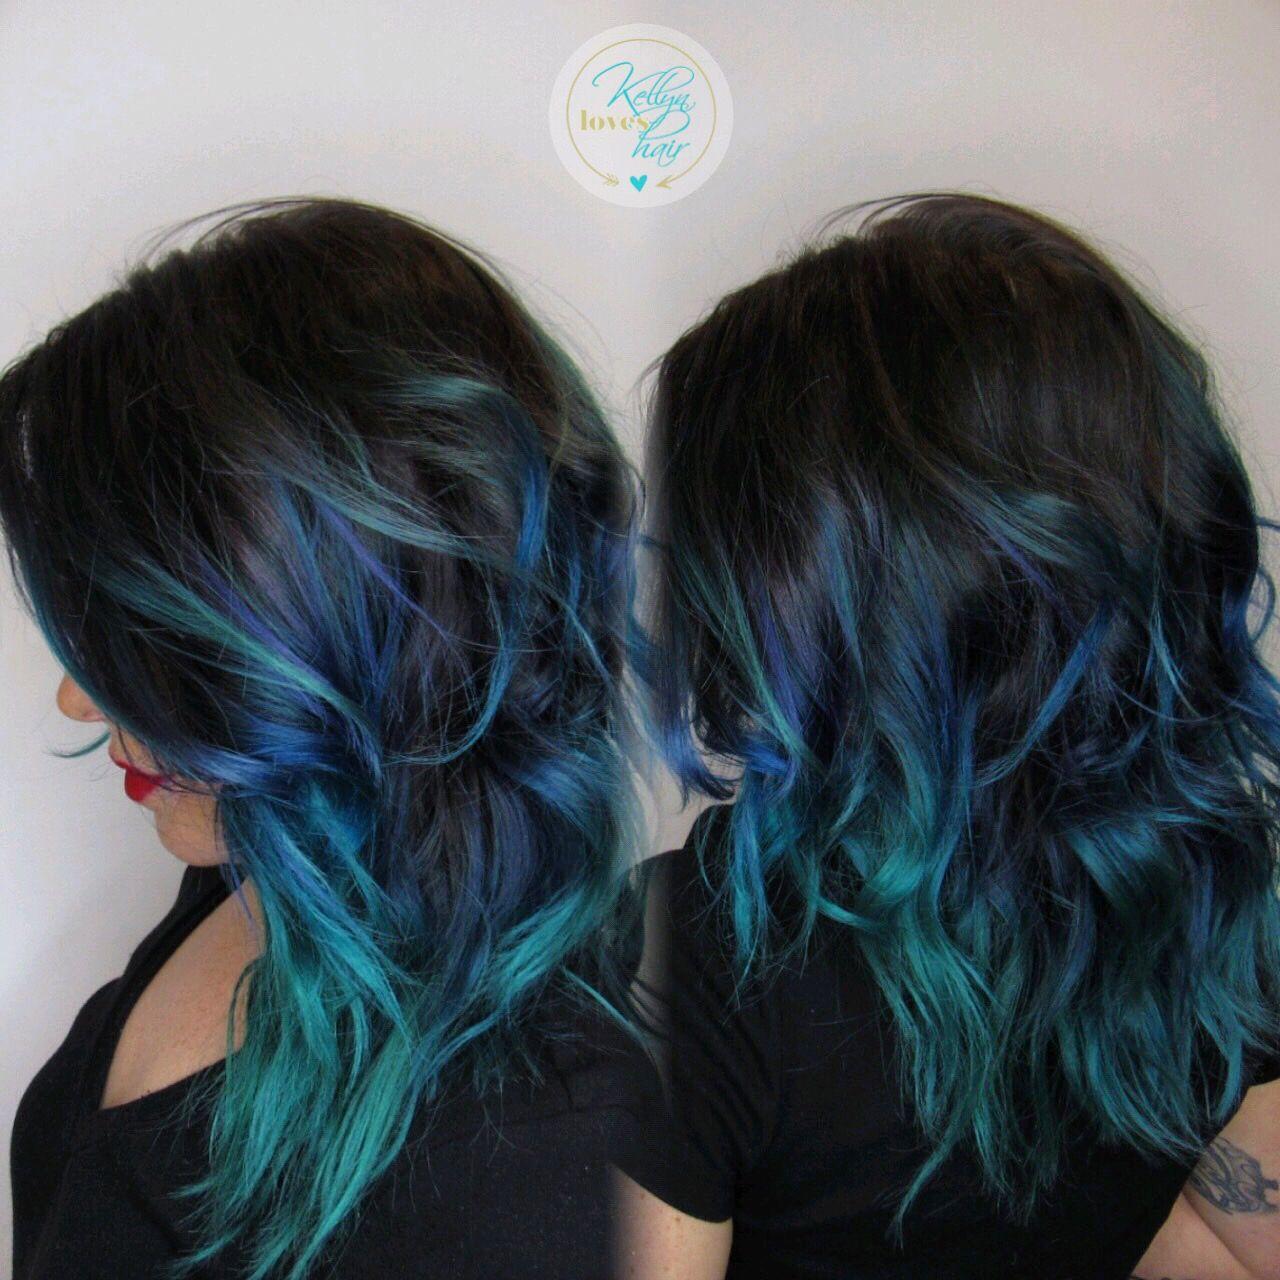 Black, blue, teal vivid hair color melt - by Kellyn at Bow ...